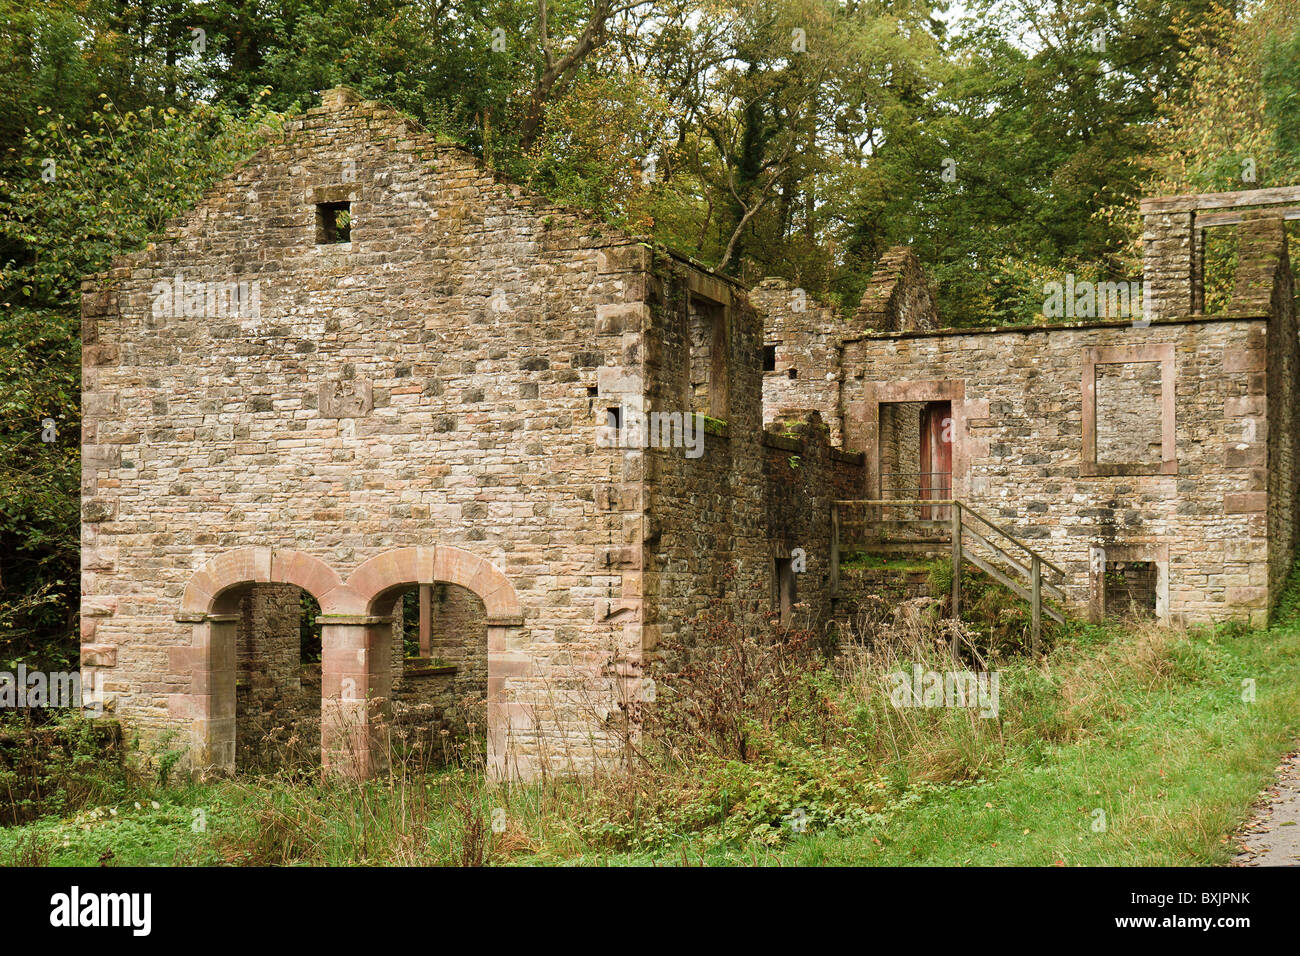 UK Cumbria Caldbeck Ruined Bobbin Mill - Stock Image